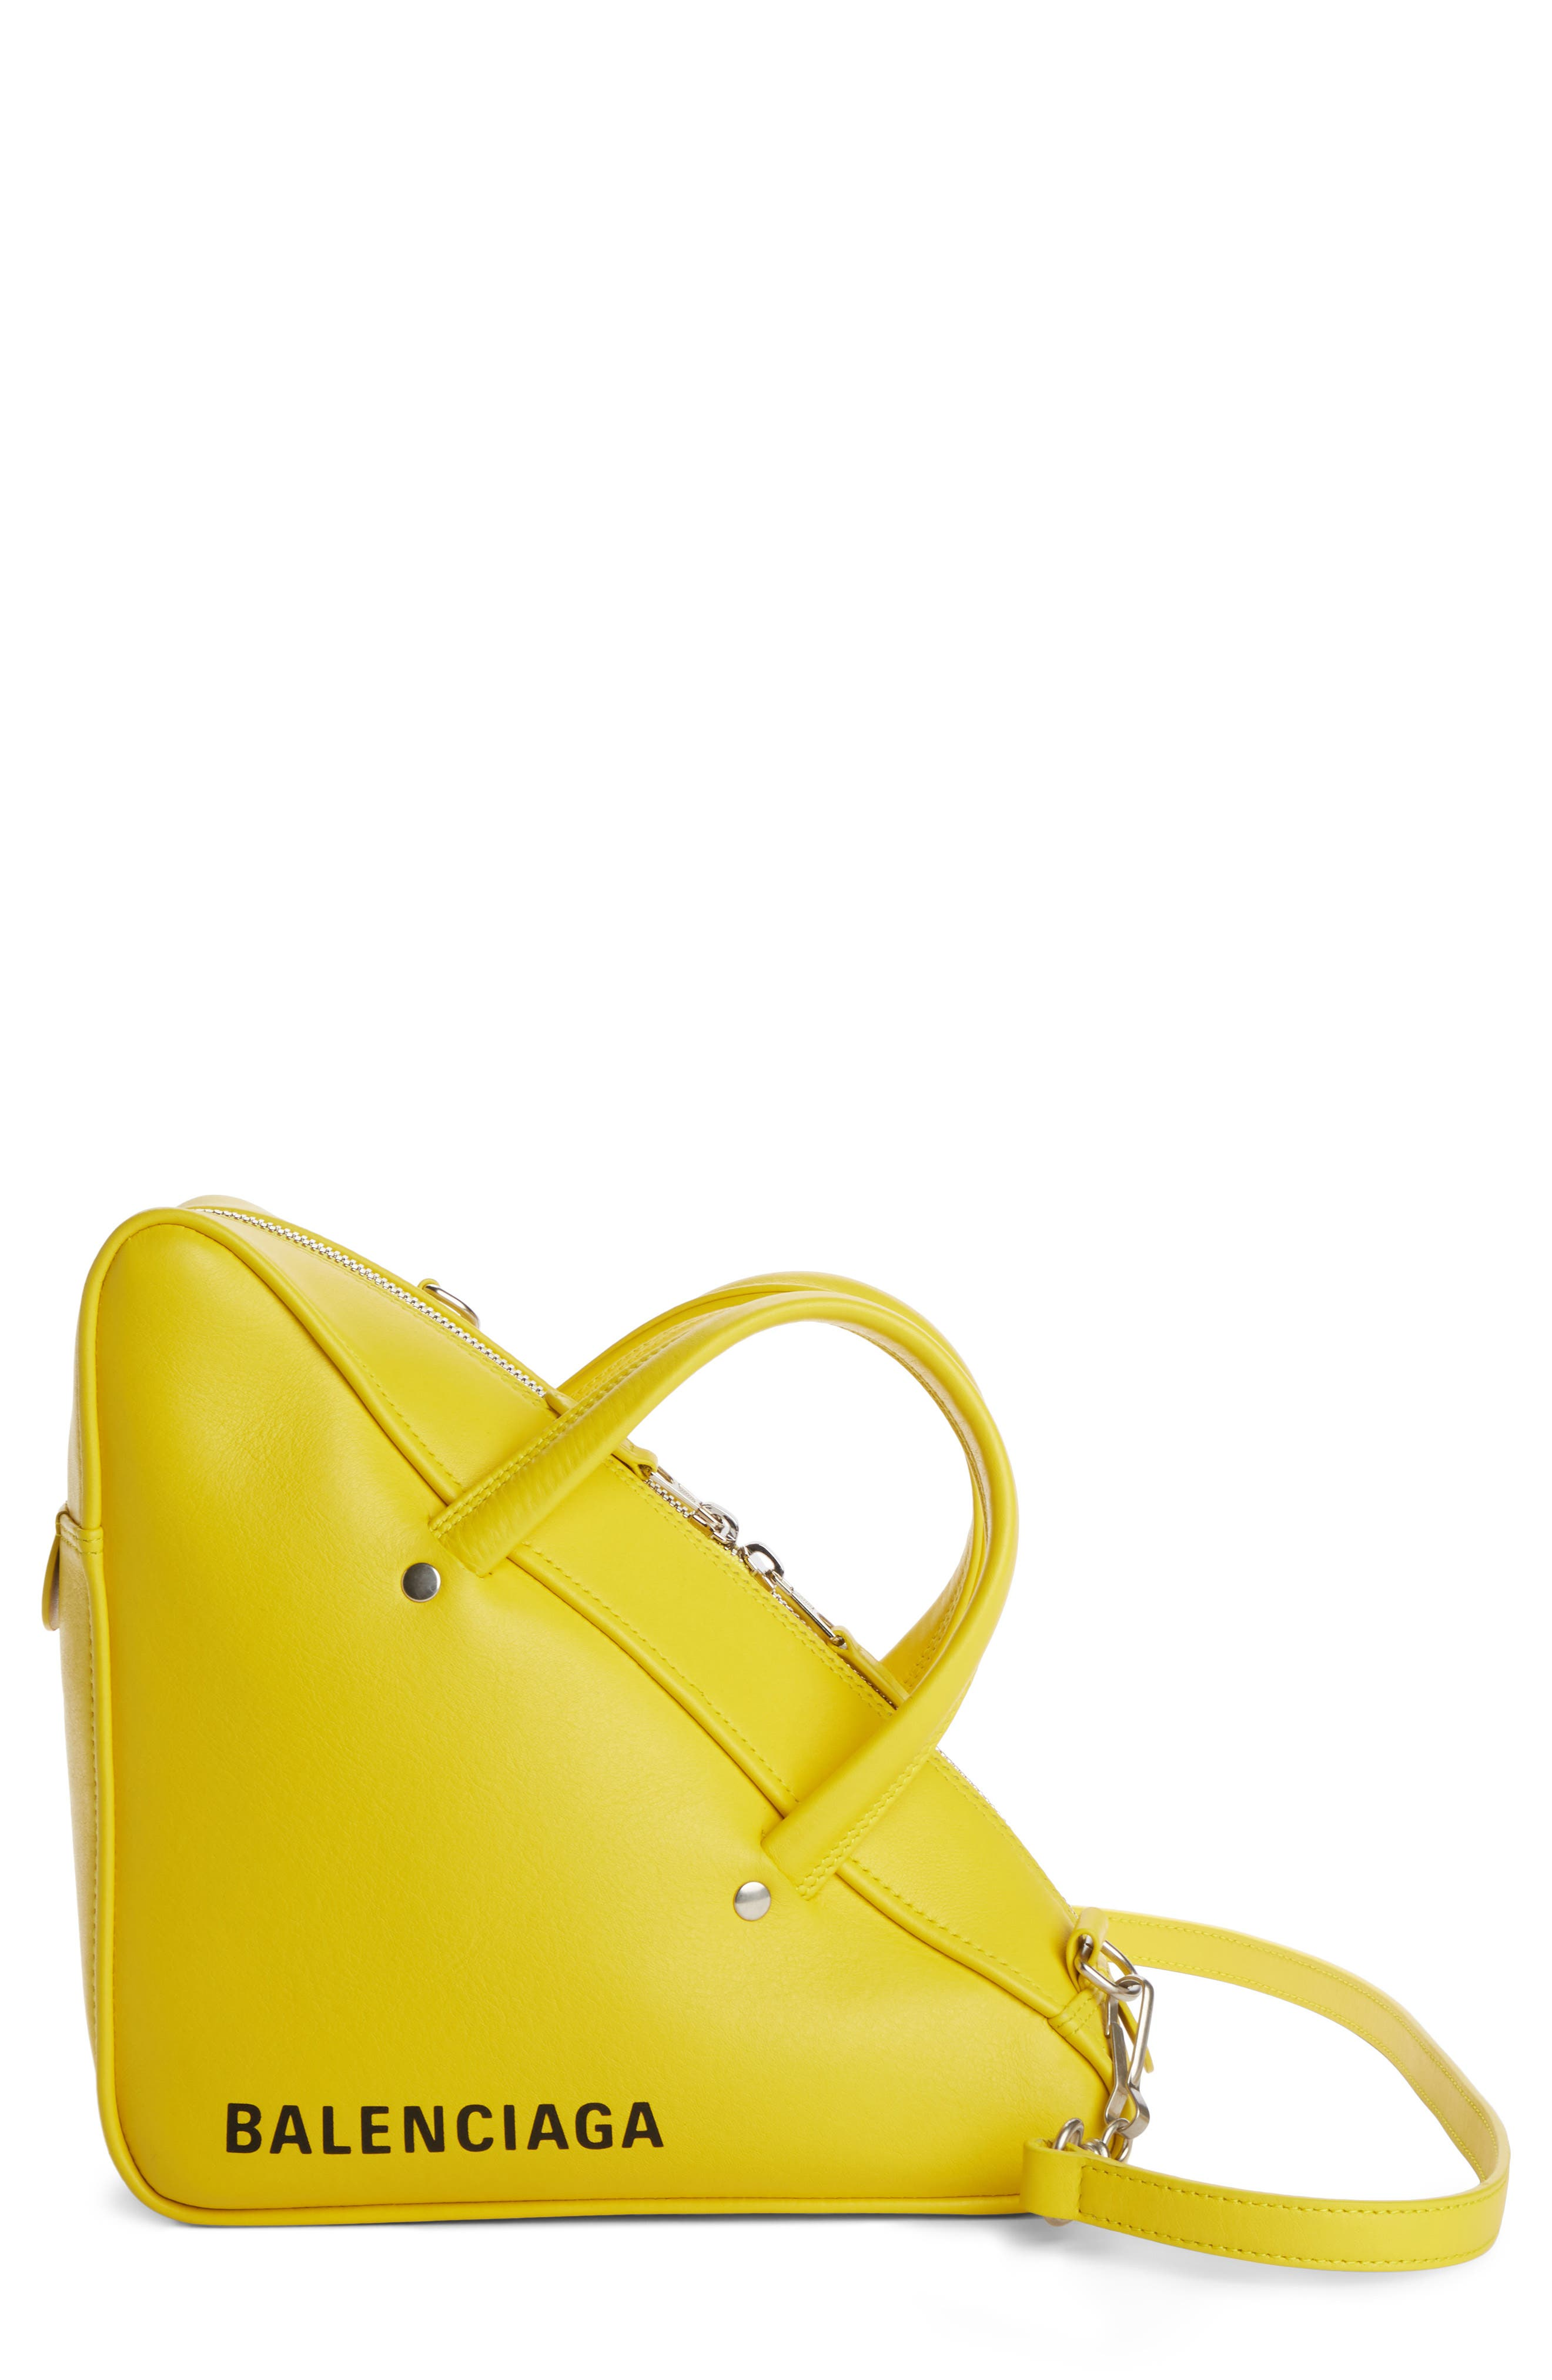 Small Triangle Duffel Bag,                         Main,                         color, Jaune